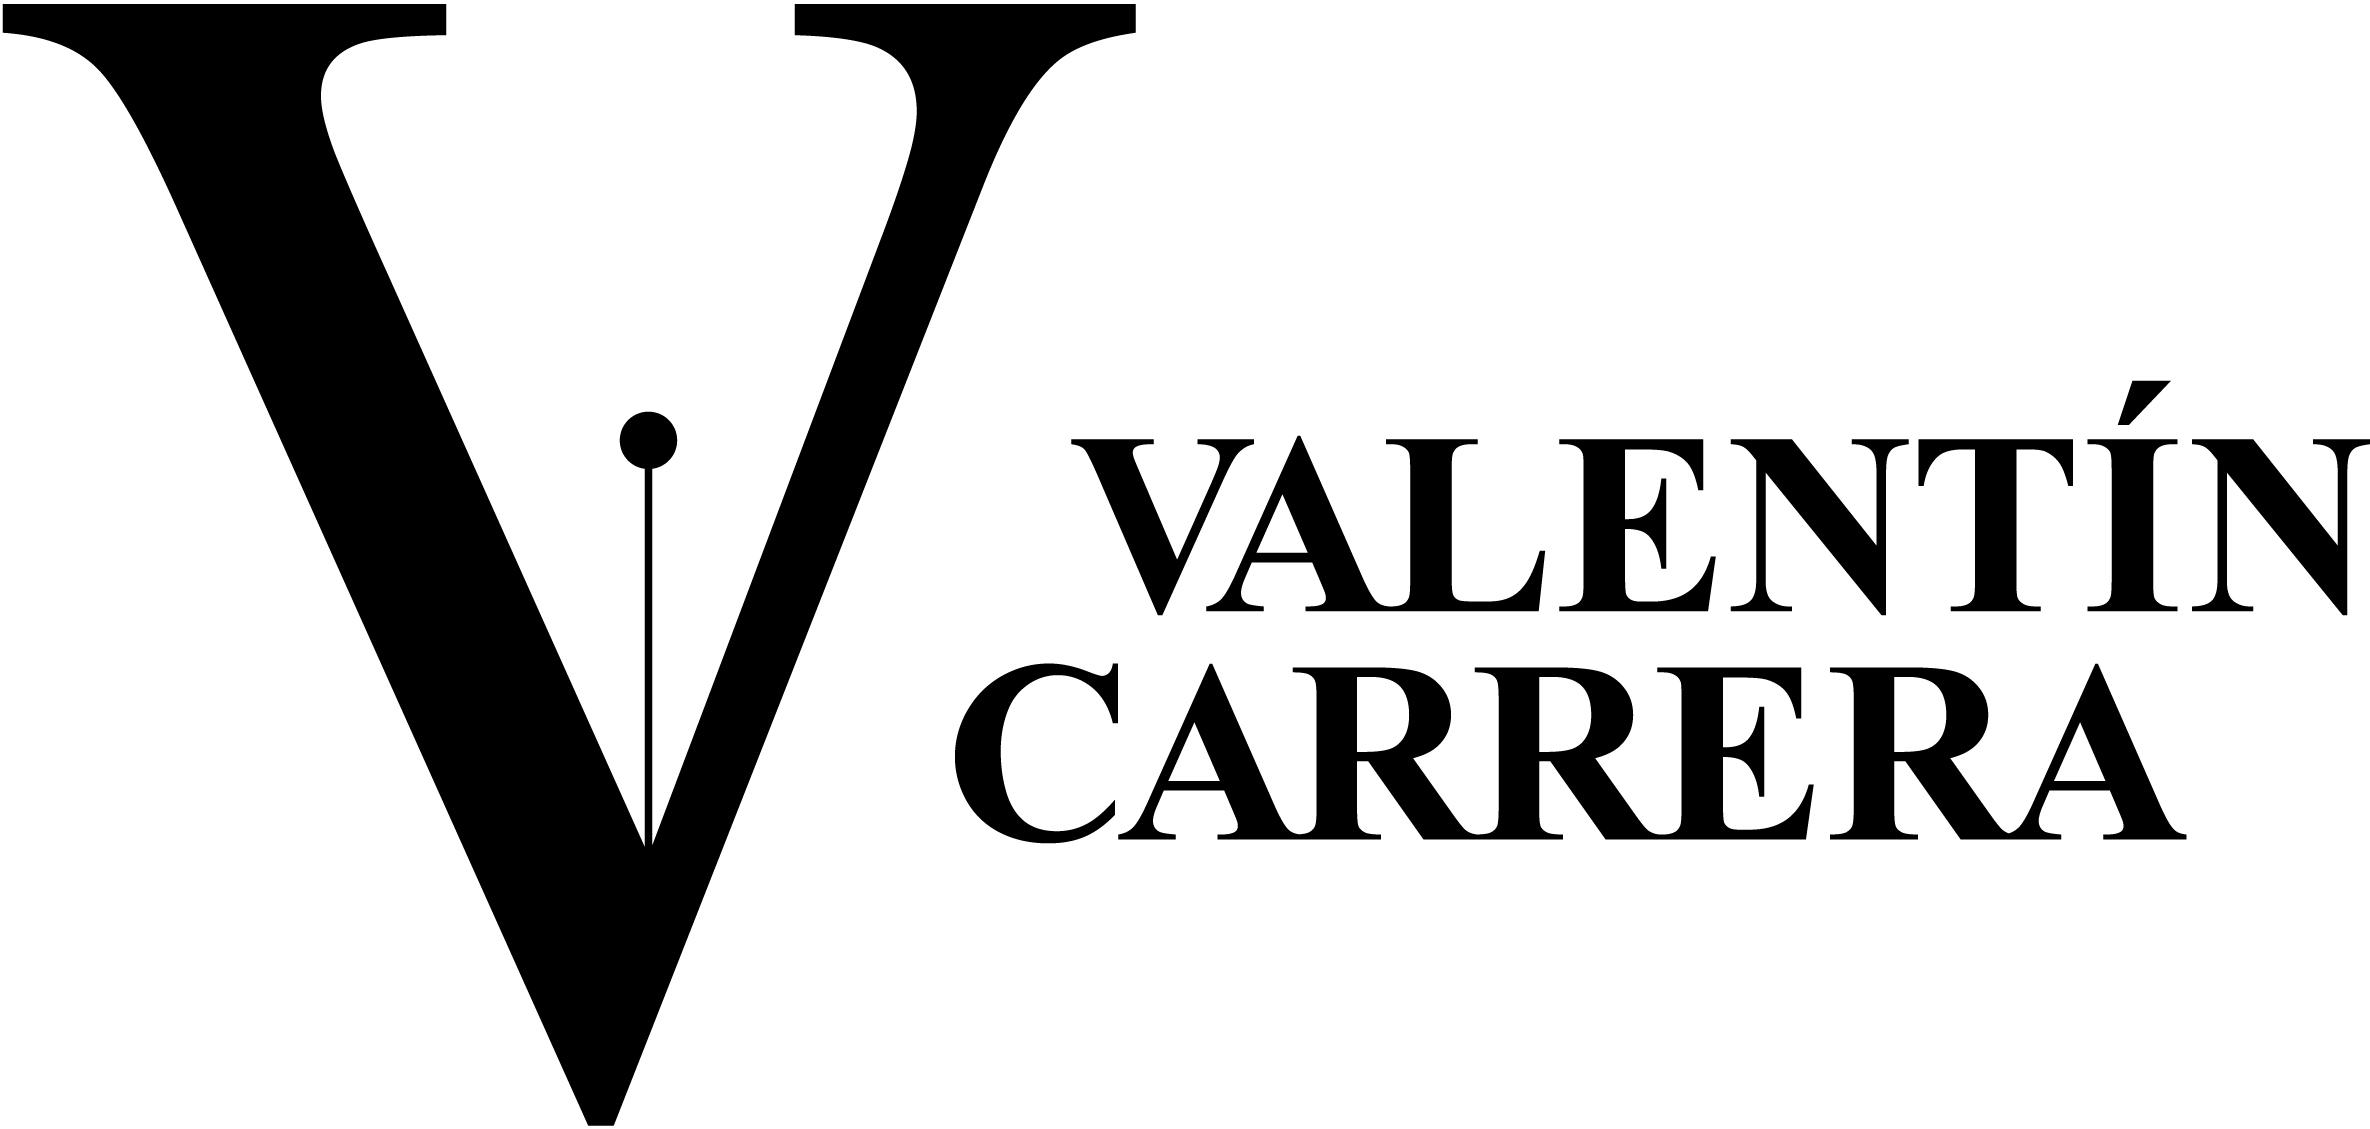 Valentin Carrera